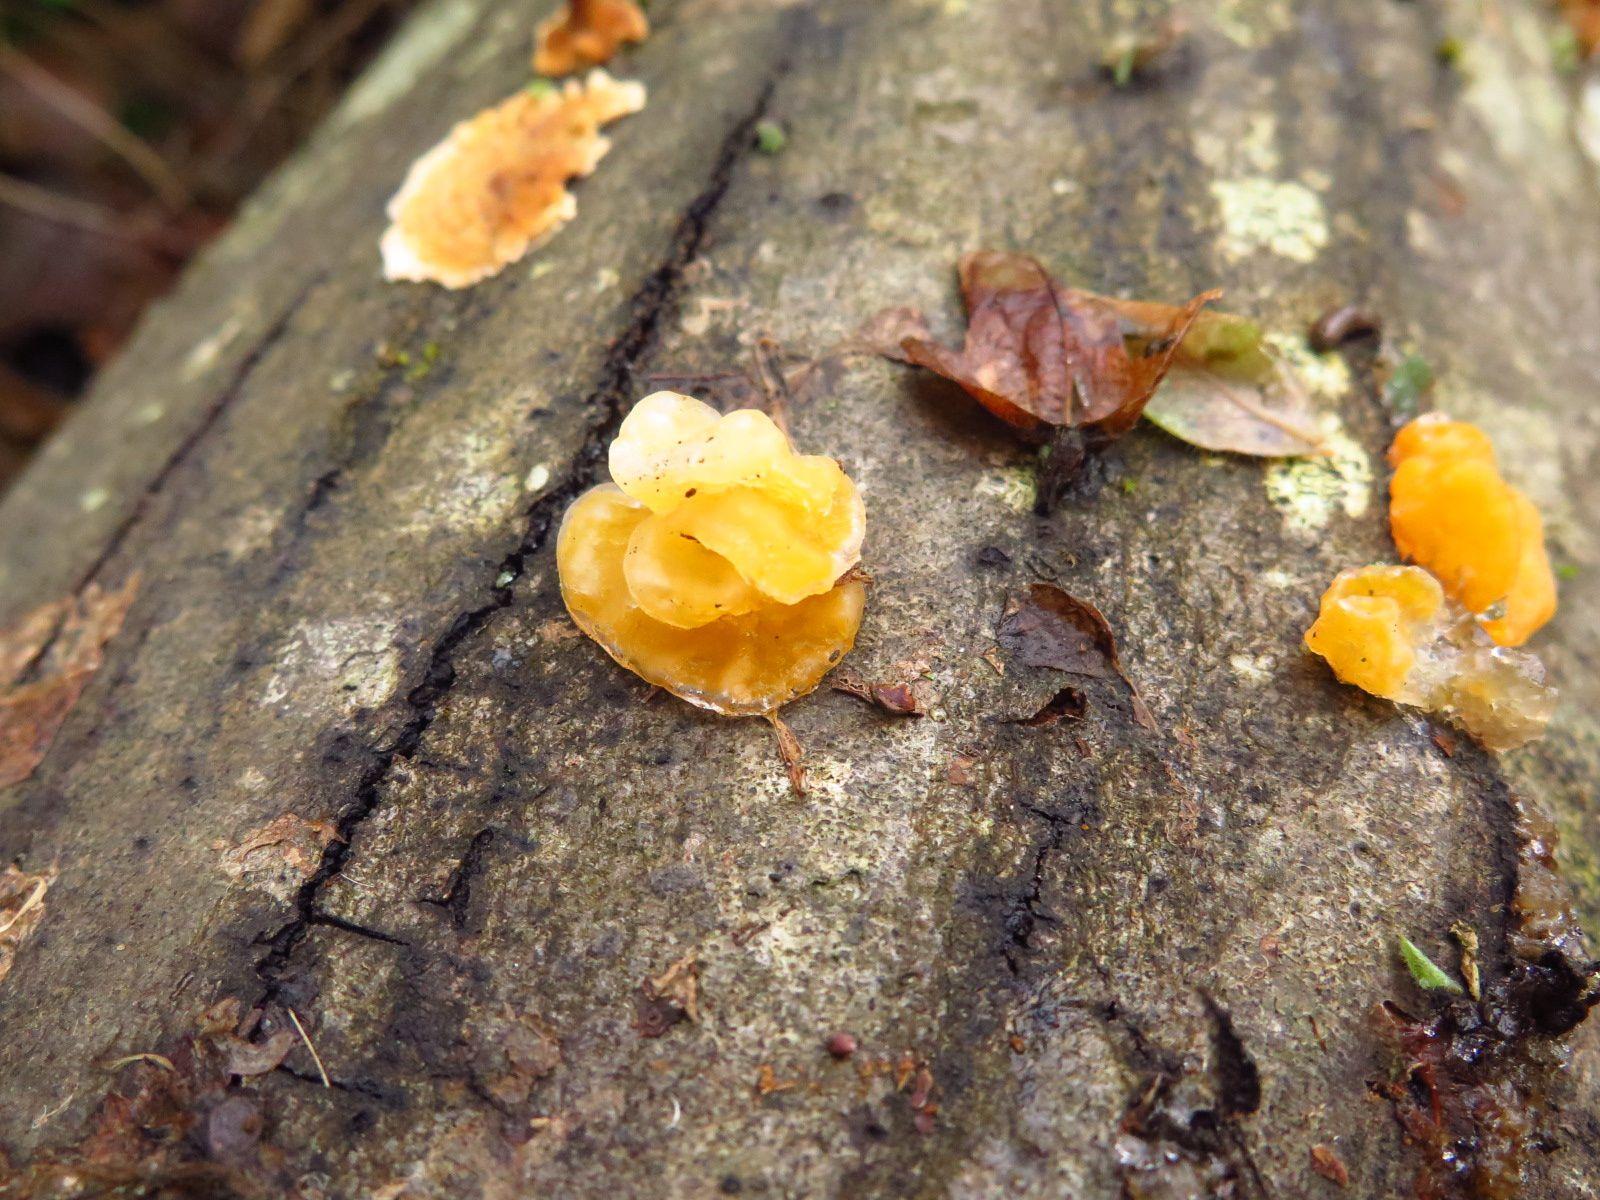 Trémelles mésentériques (Tremella mesenterica)